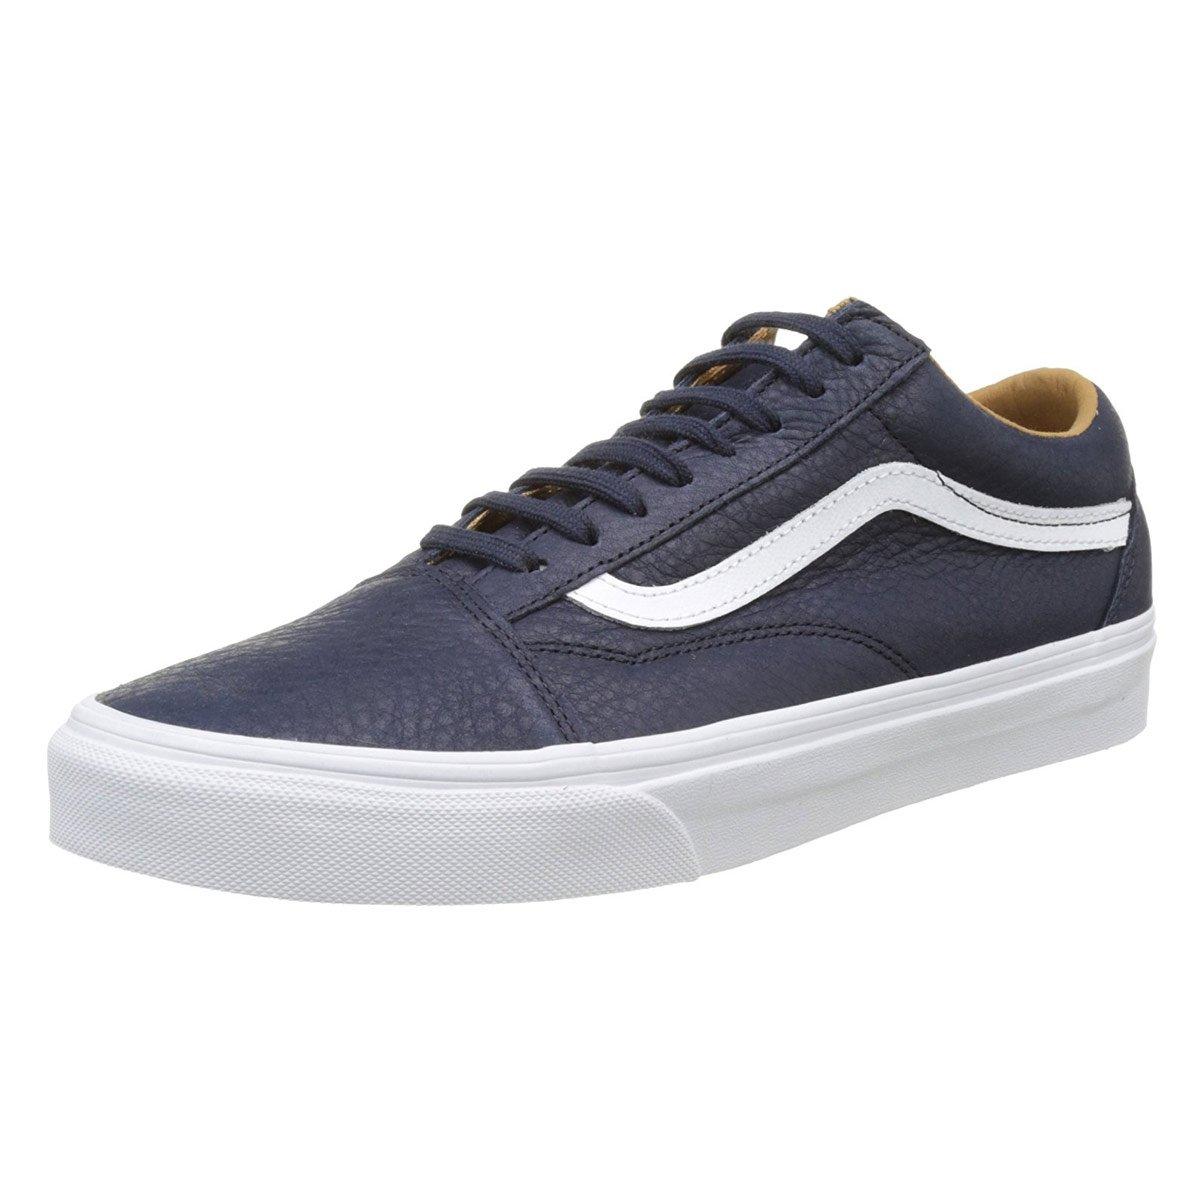 Vans Unisex-Erwachsene Old Skool Leder Parisia Sneaker, Schwarz (Premium Leder) Parisia Leder 4e92a6